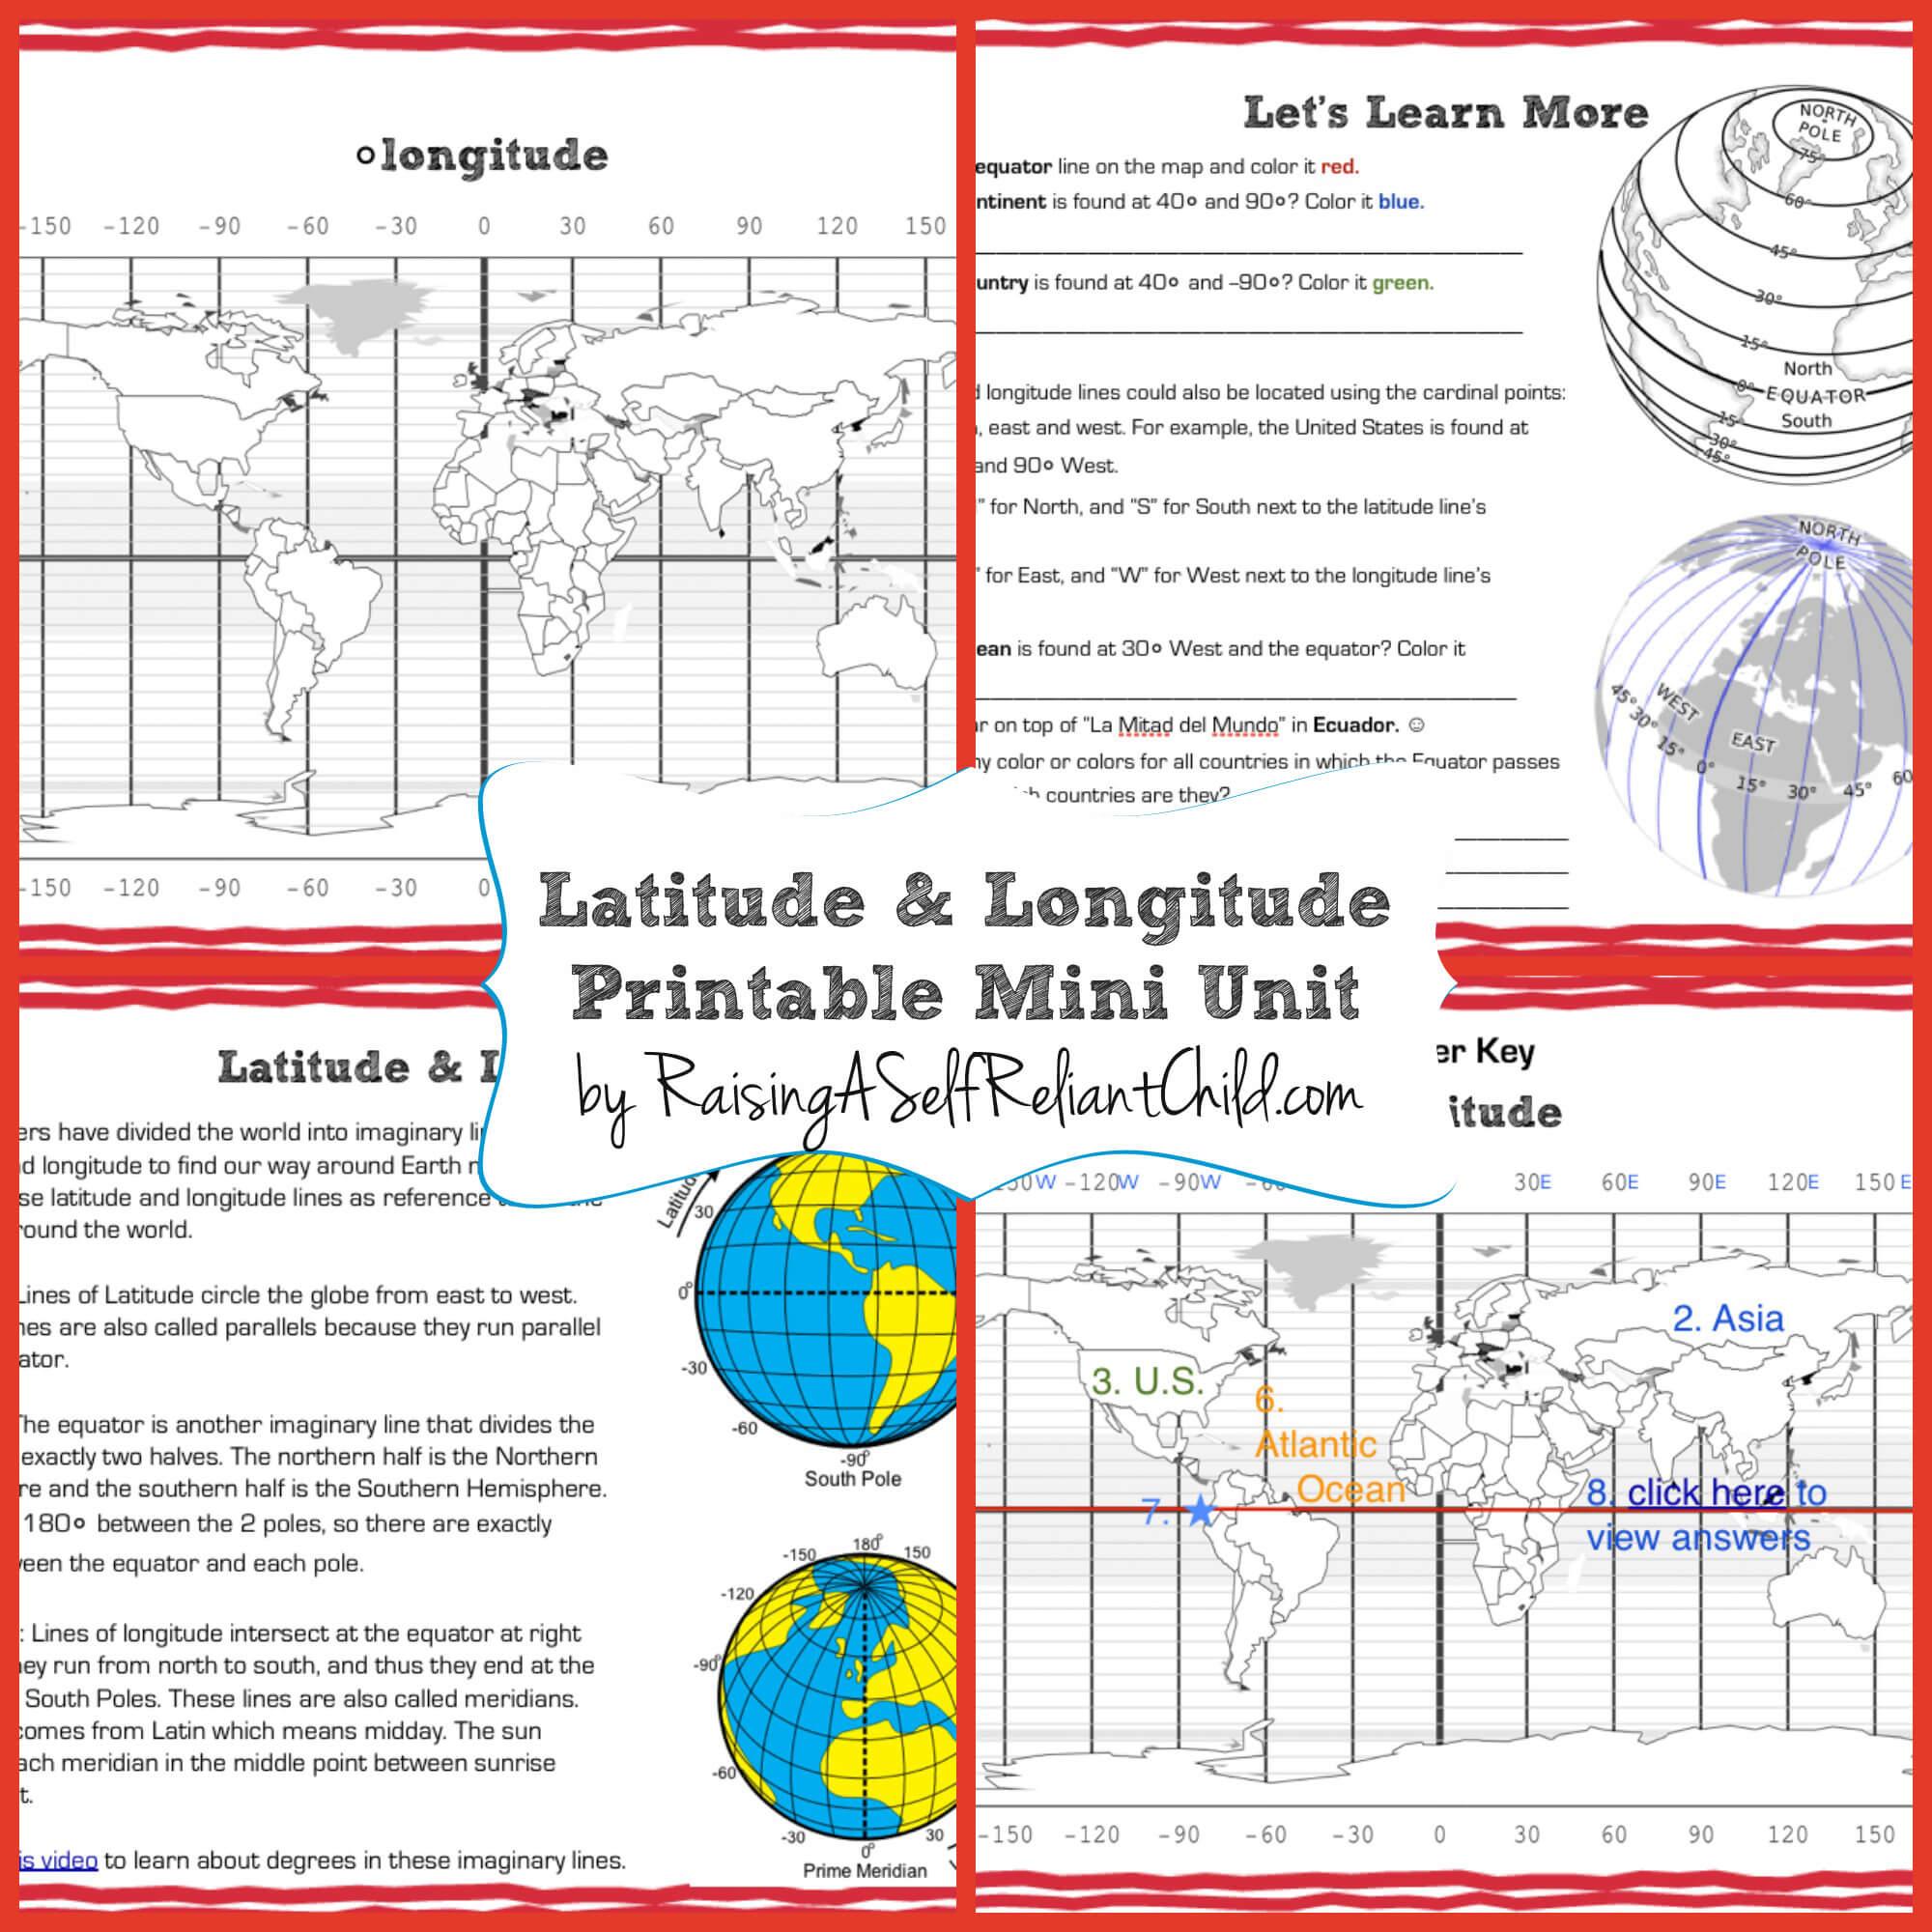 Free Printable Mini Unit Latitude And Longitude For Kids